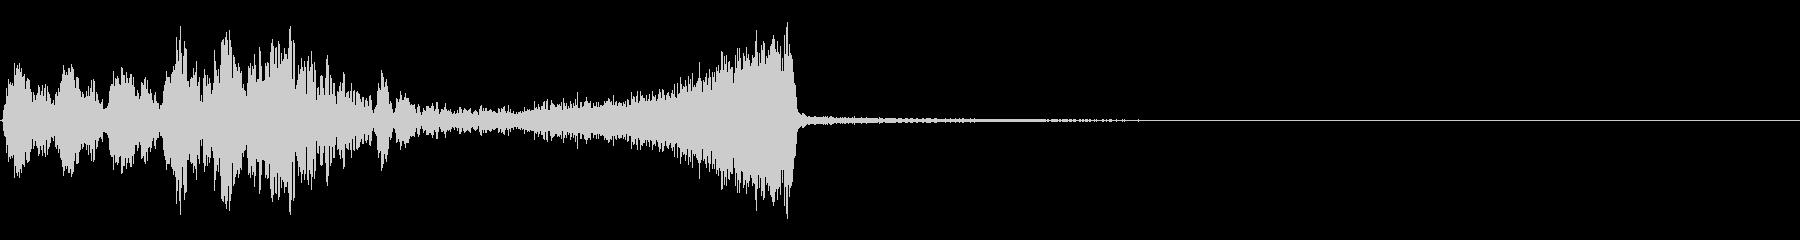 SynthHit EC03_14_3の未再生の波形